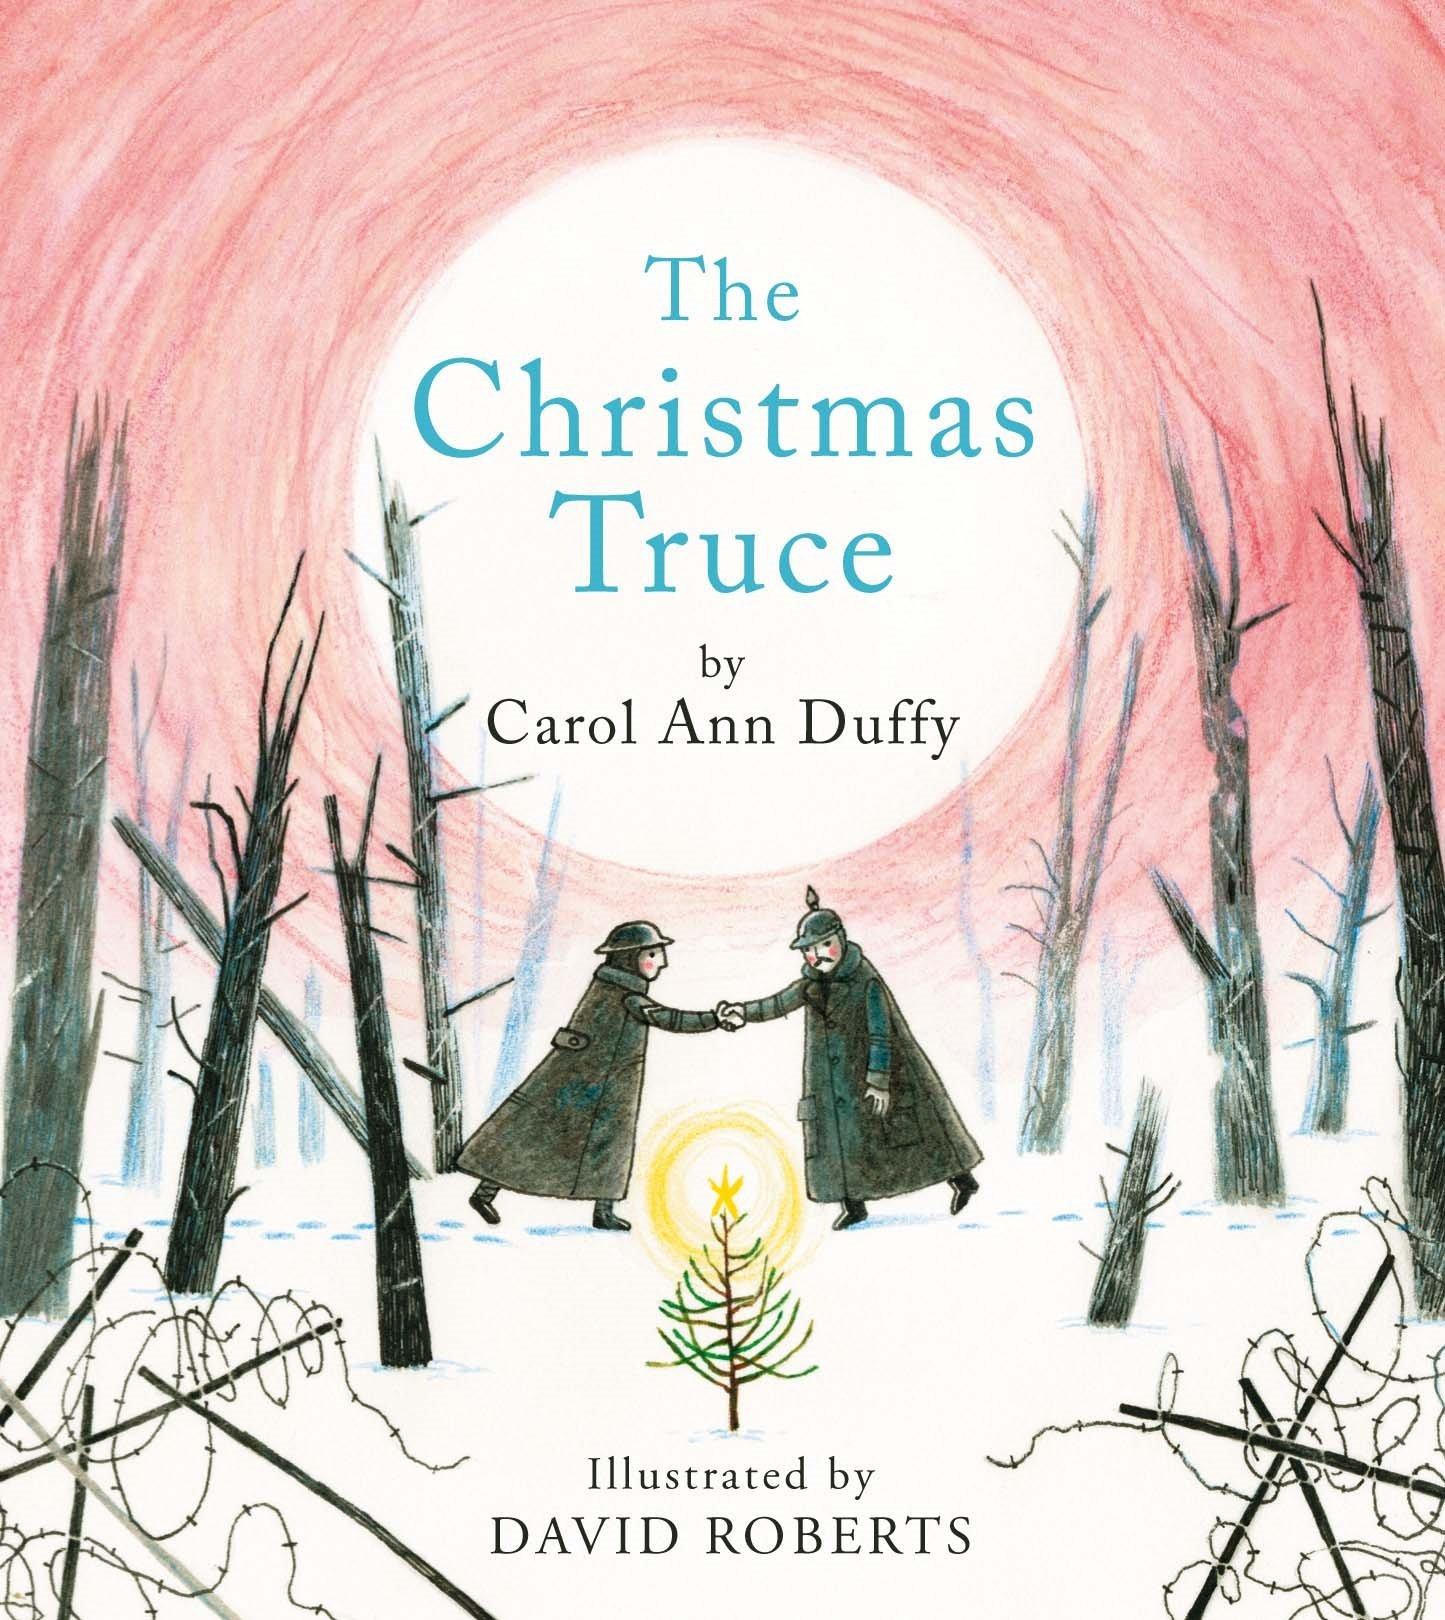 Dec 15th: Steven Lenton chooses The Christmas Truce · Story Snug